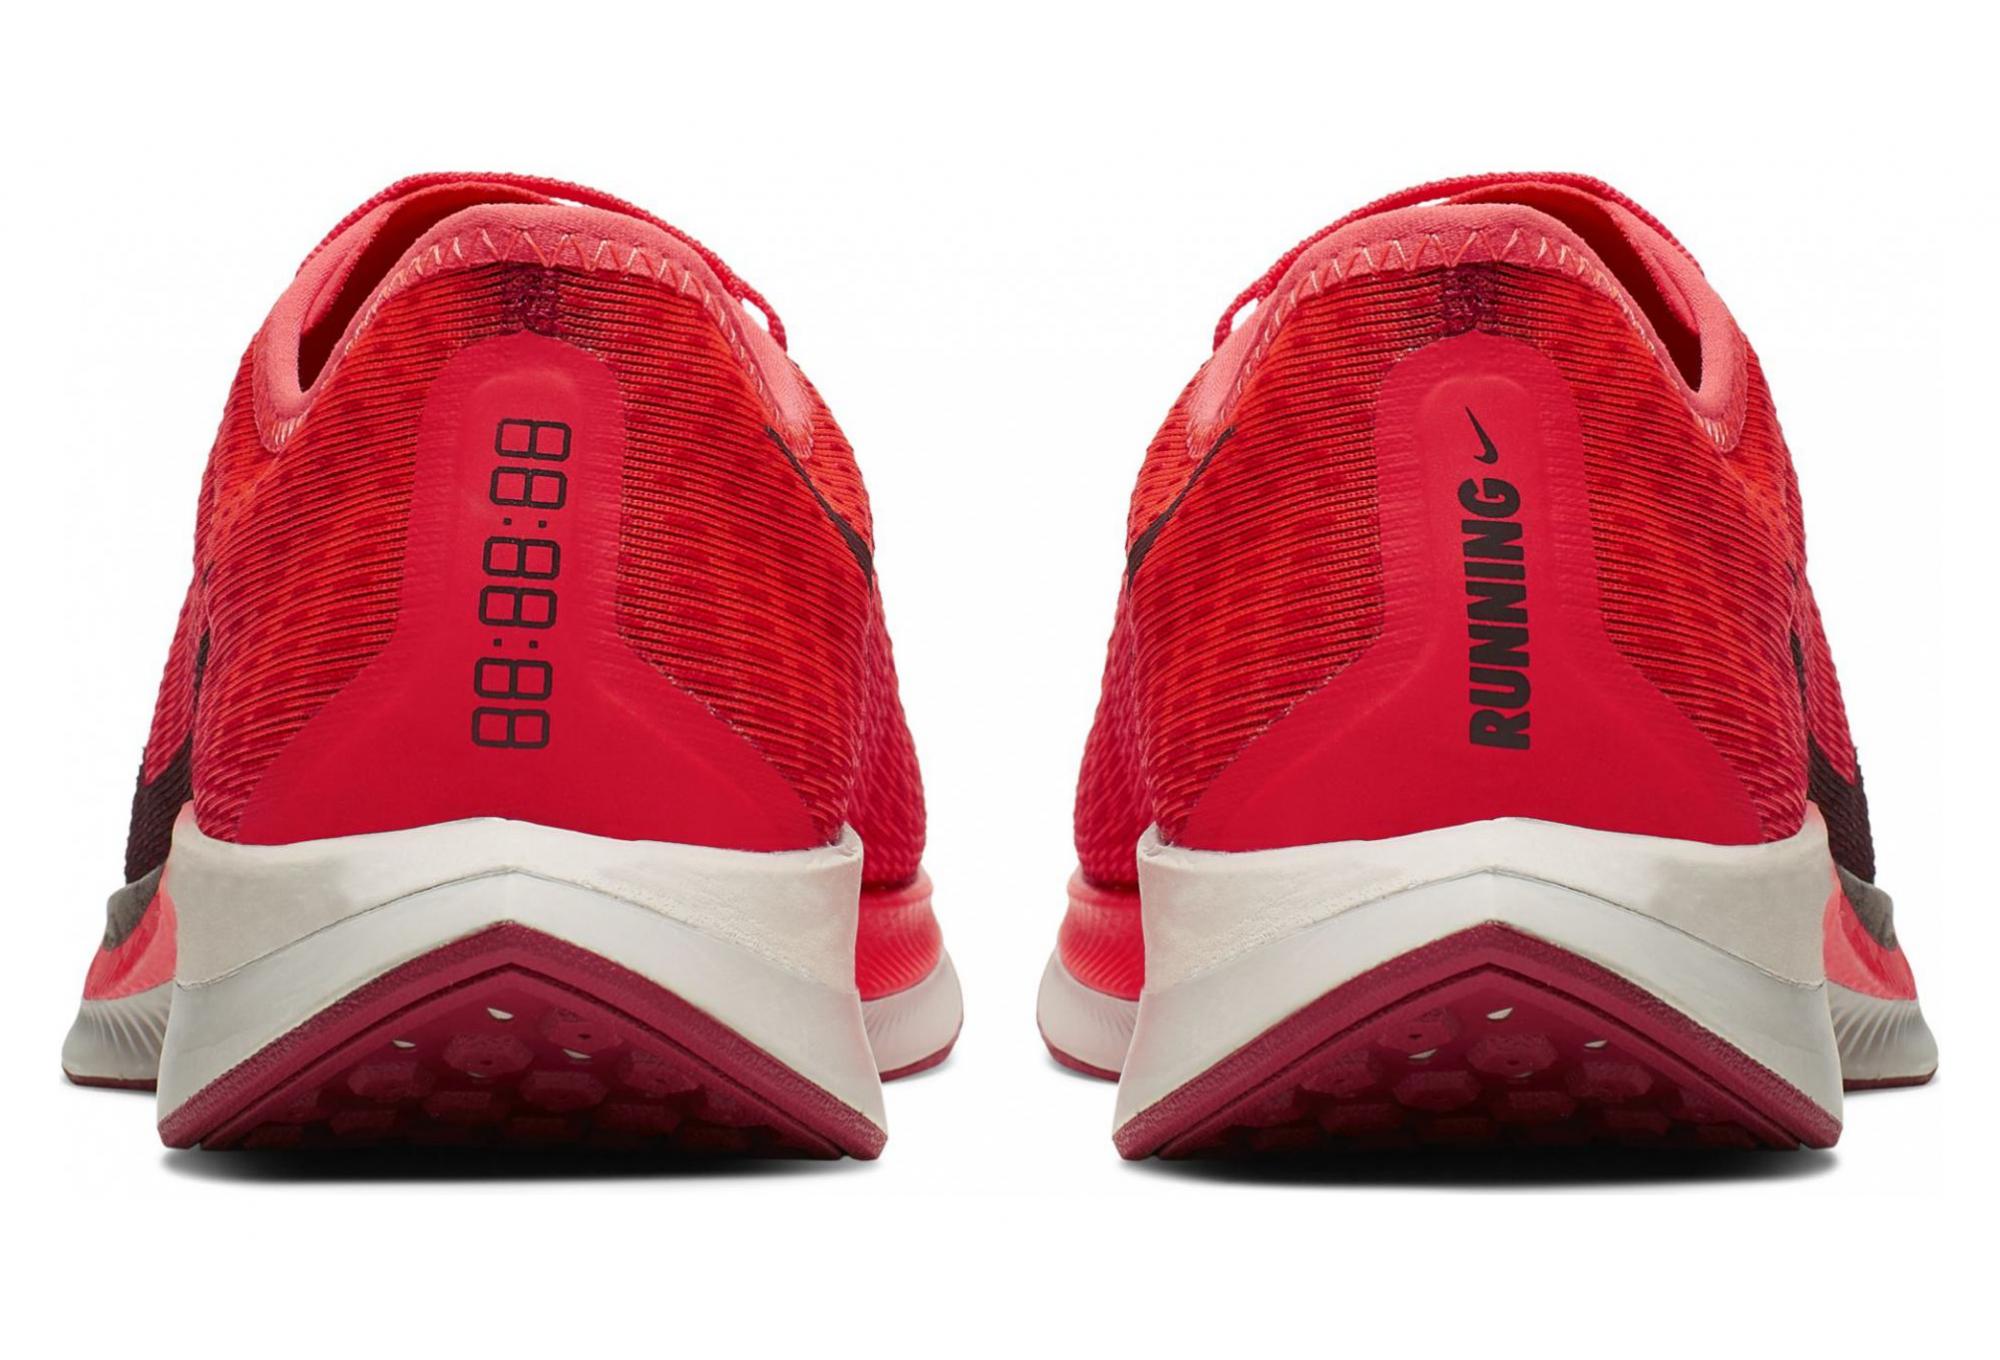 various styles wholesale sales sale usa online Nike Zoom Pegasus Turbo 2 Rouge Homme